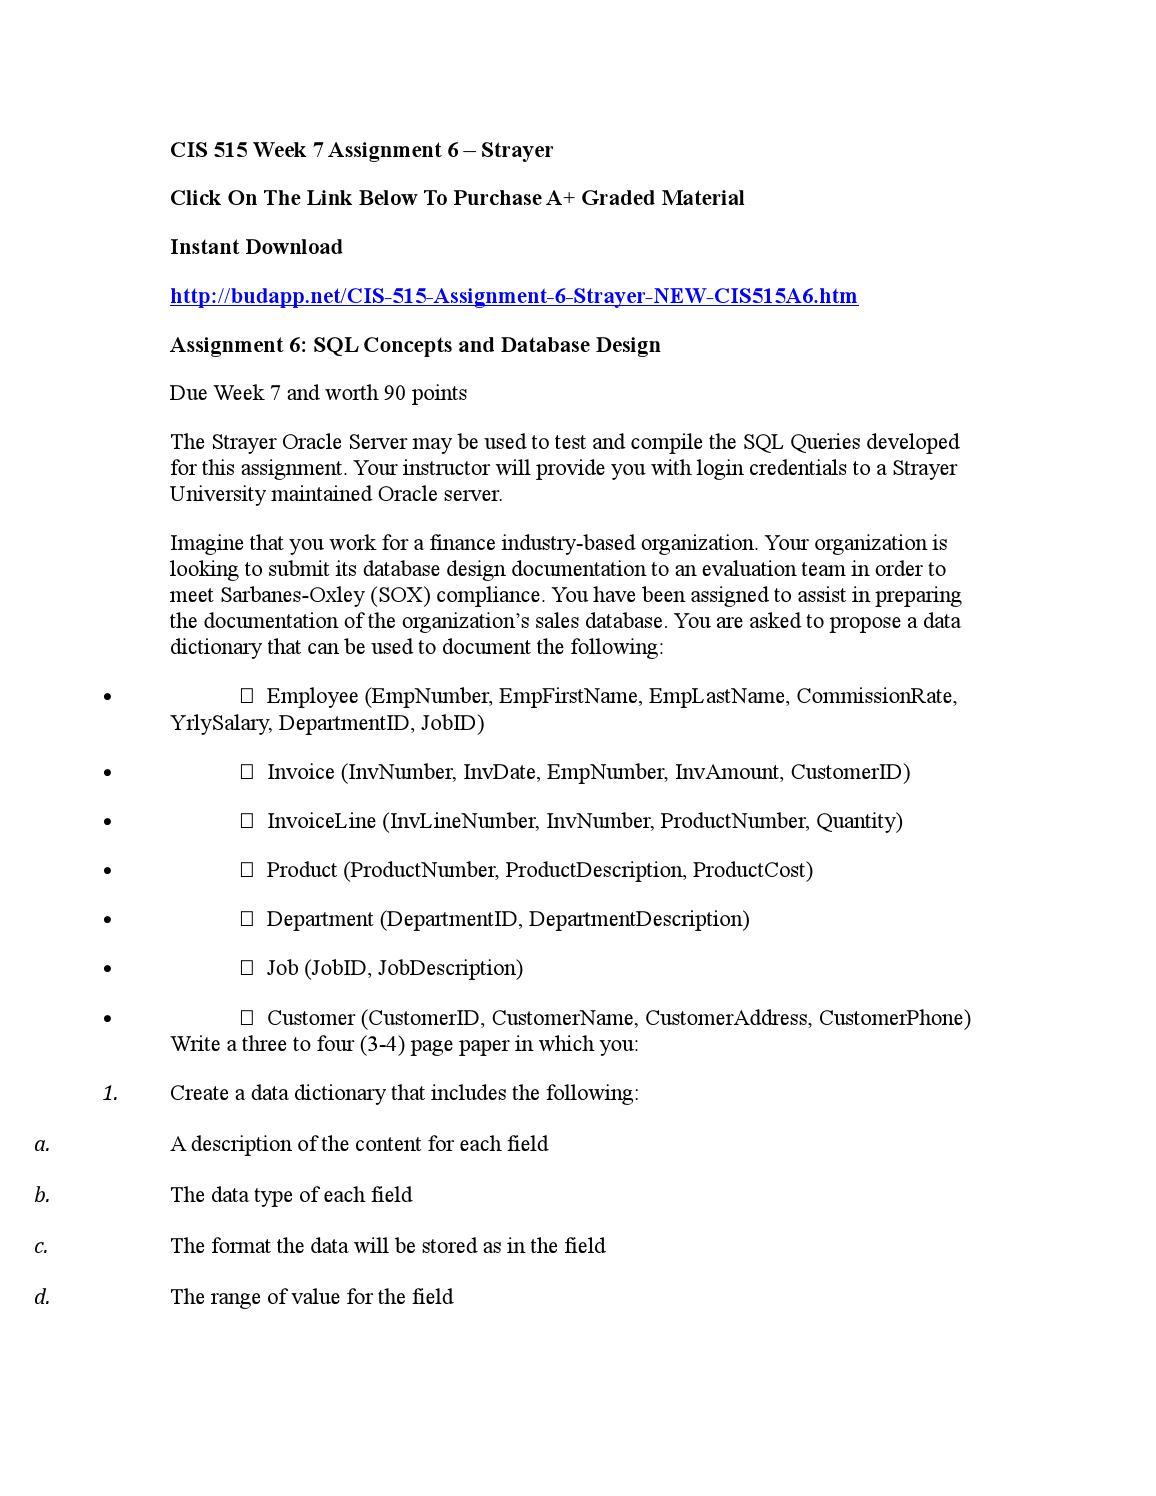 CIS 515 CIS/515 CIS515 Week 8 Case Study Database Development (Strayer University)